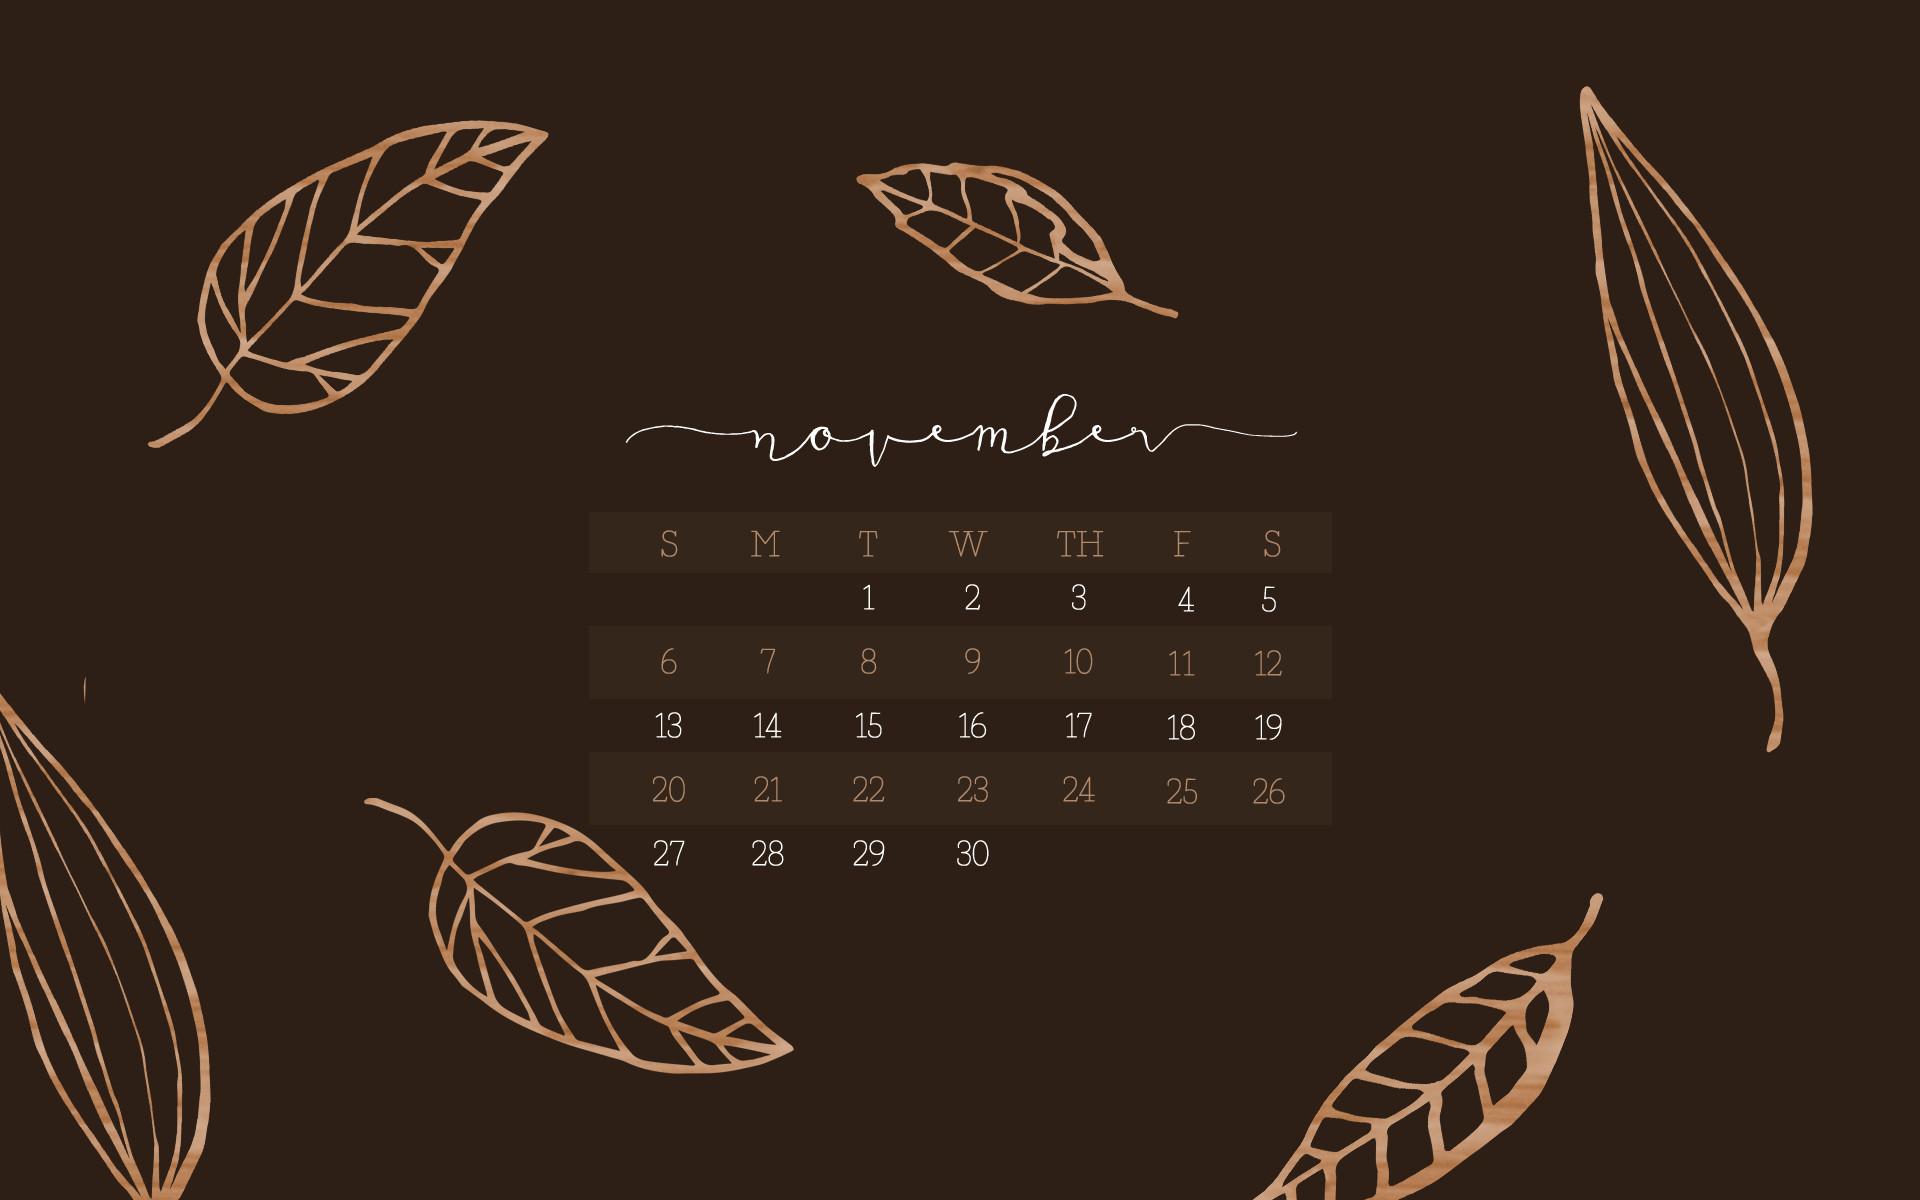 Download Your November Calendar Wallpaper